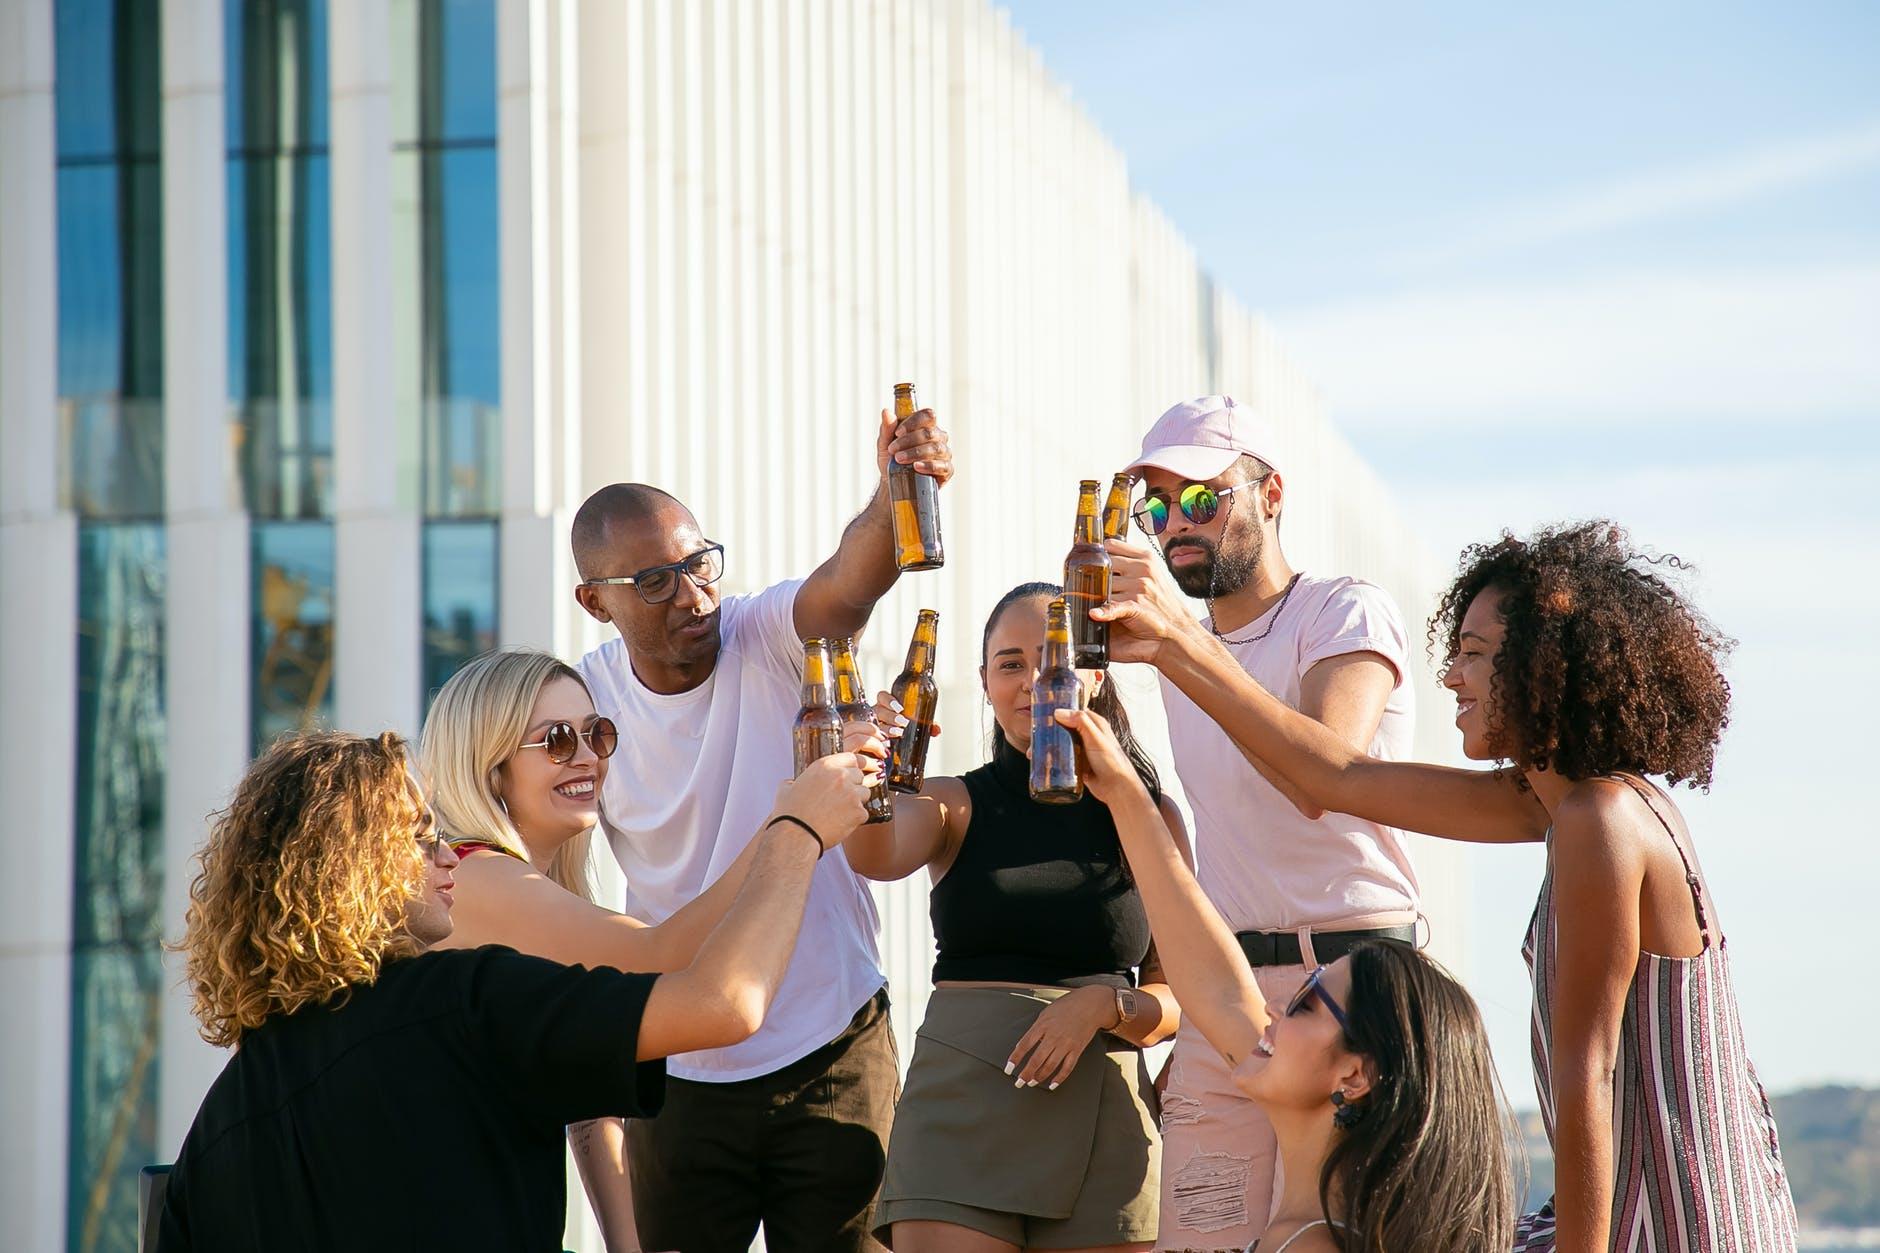 joyful diverse friends clinking beer bottles on rooftop